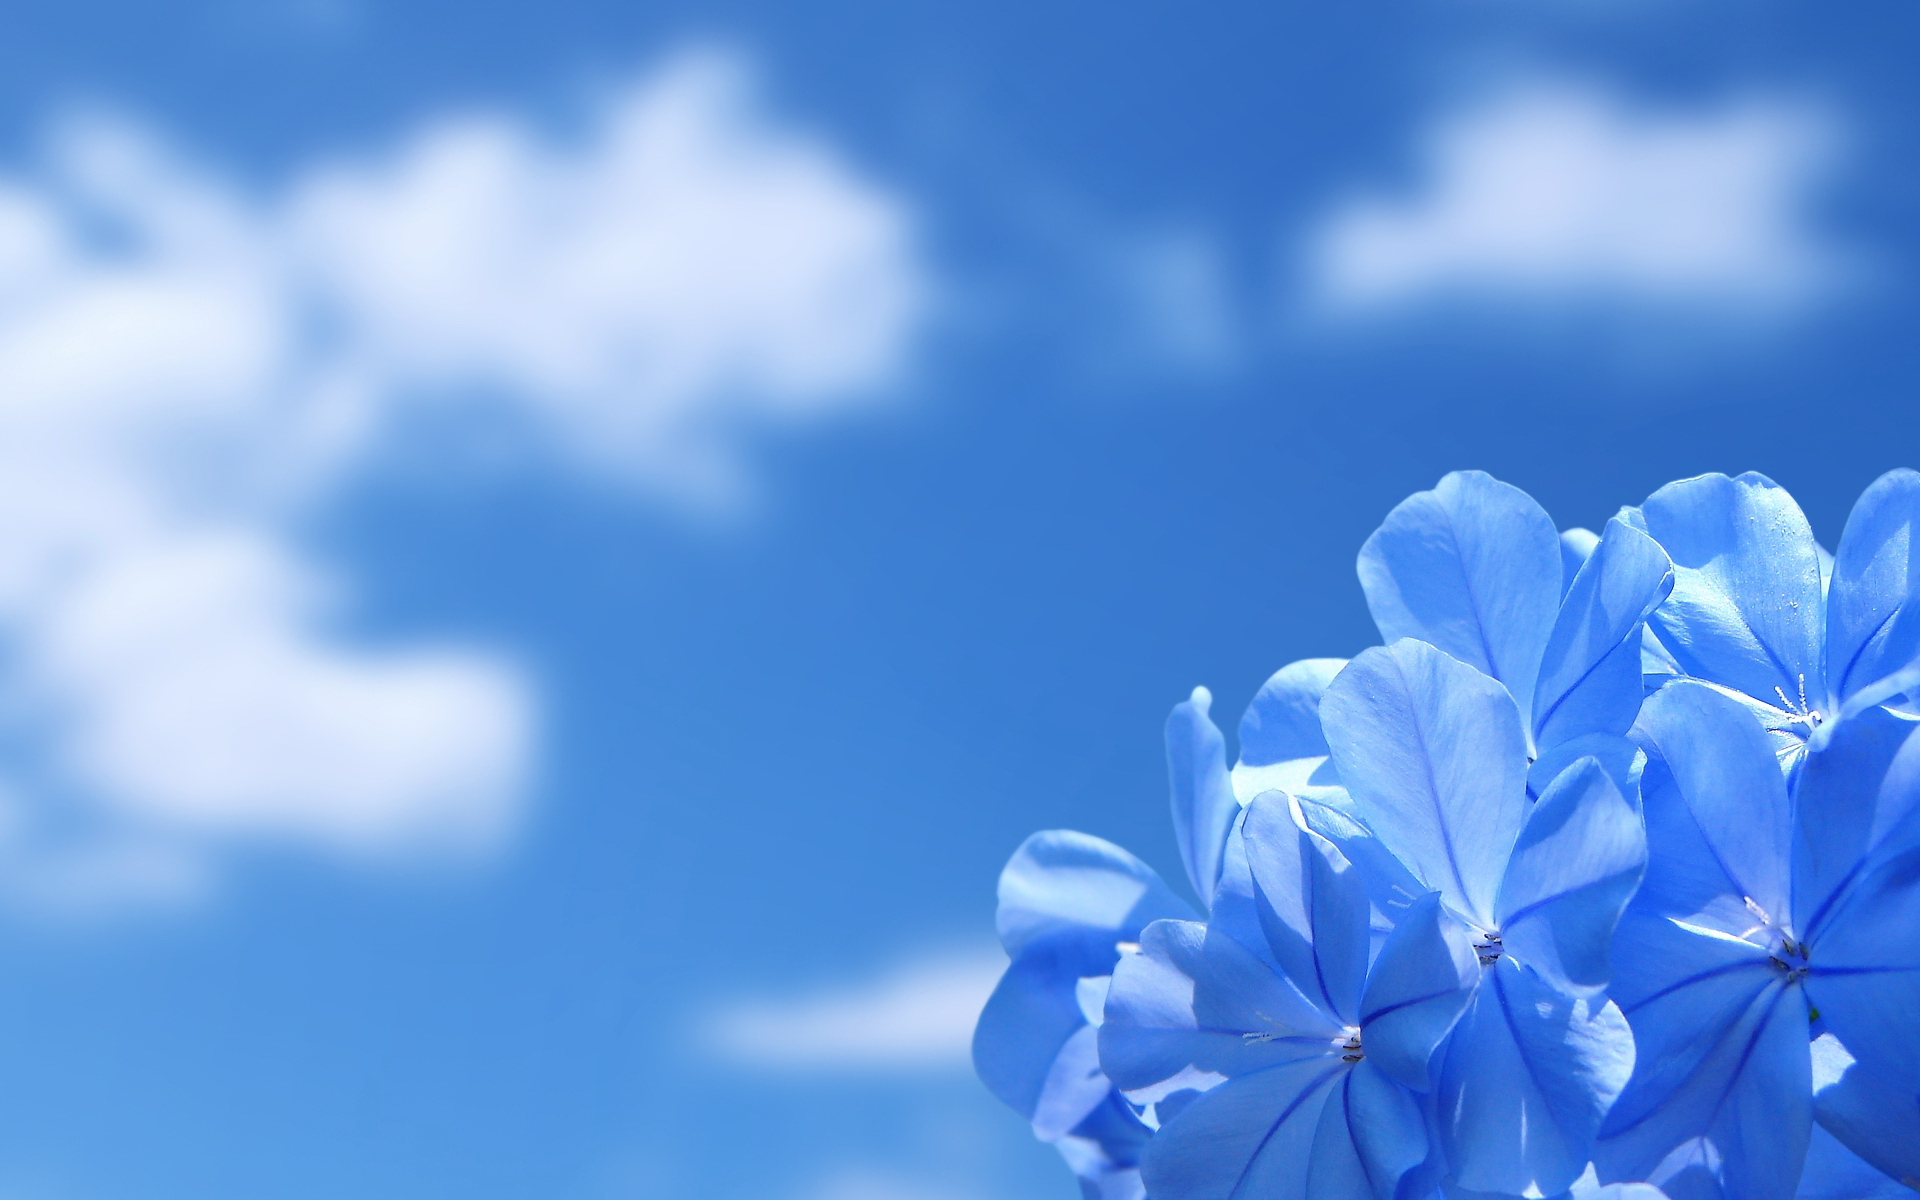 desktop backgrounds flowers blue wallpapers flower 1920x1200 1920x1200